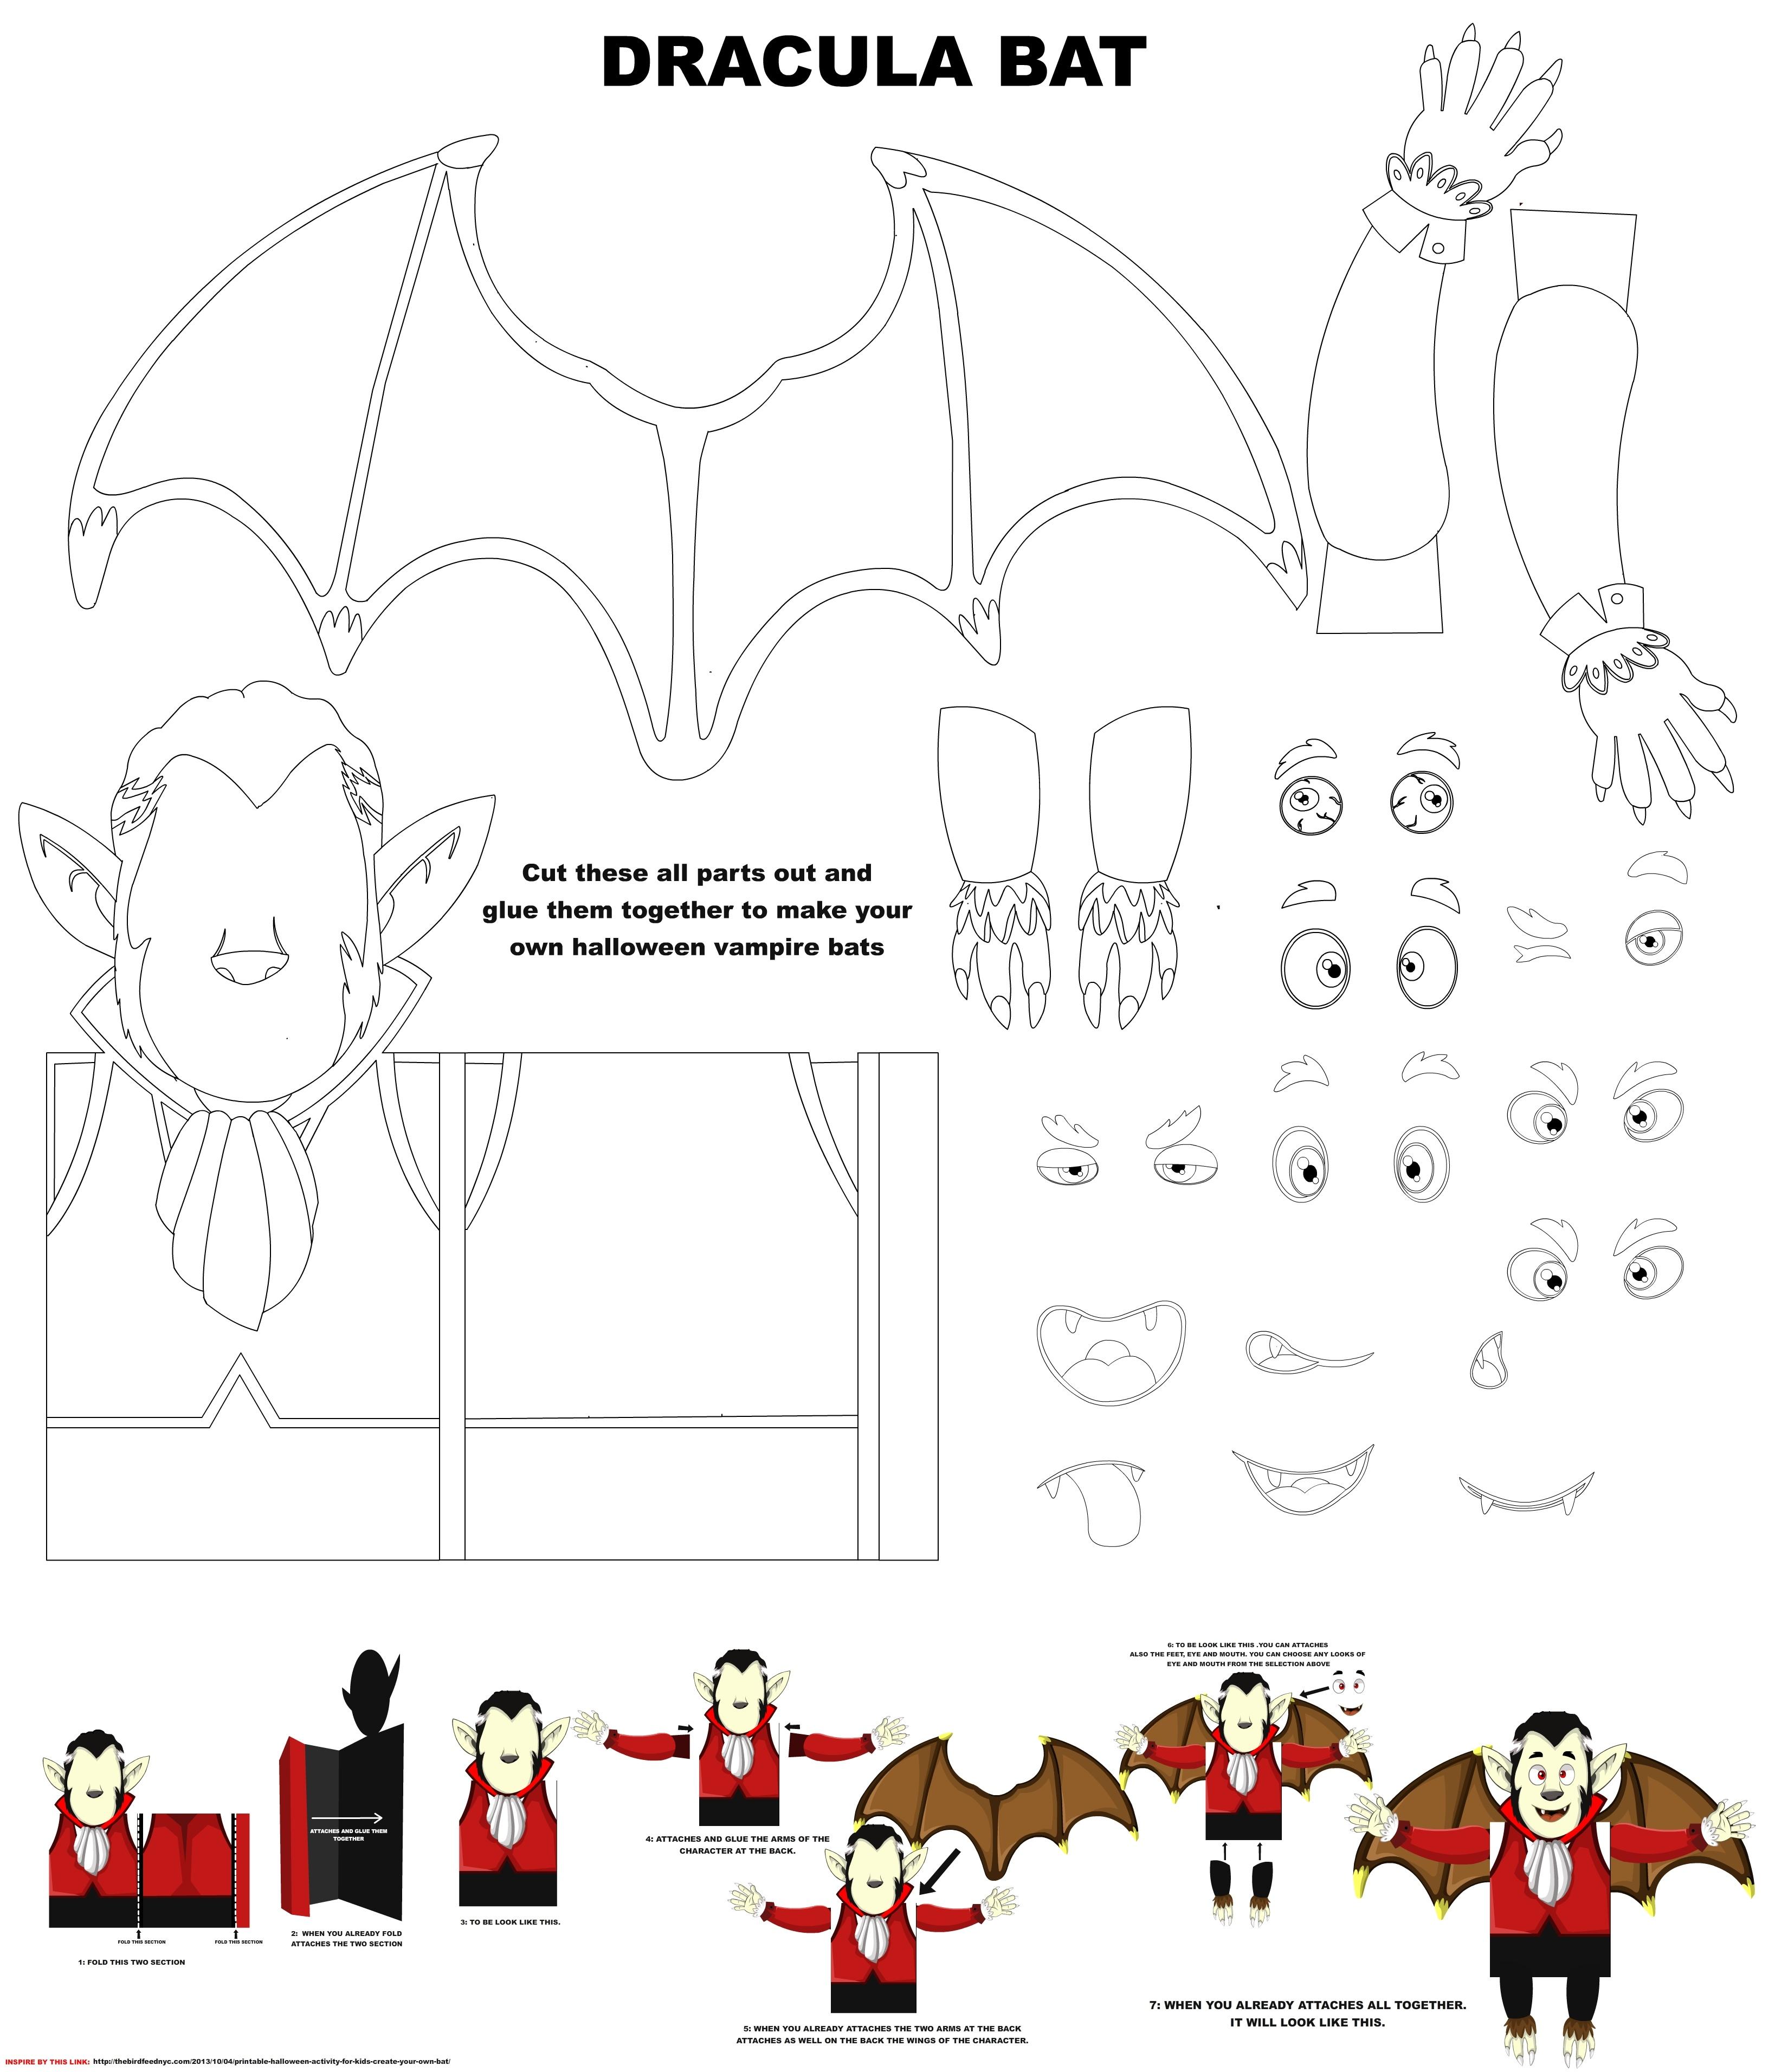 Dracula Bat (plain) - Studyladder Interactive Learning Games